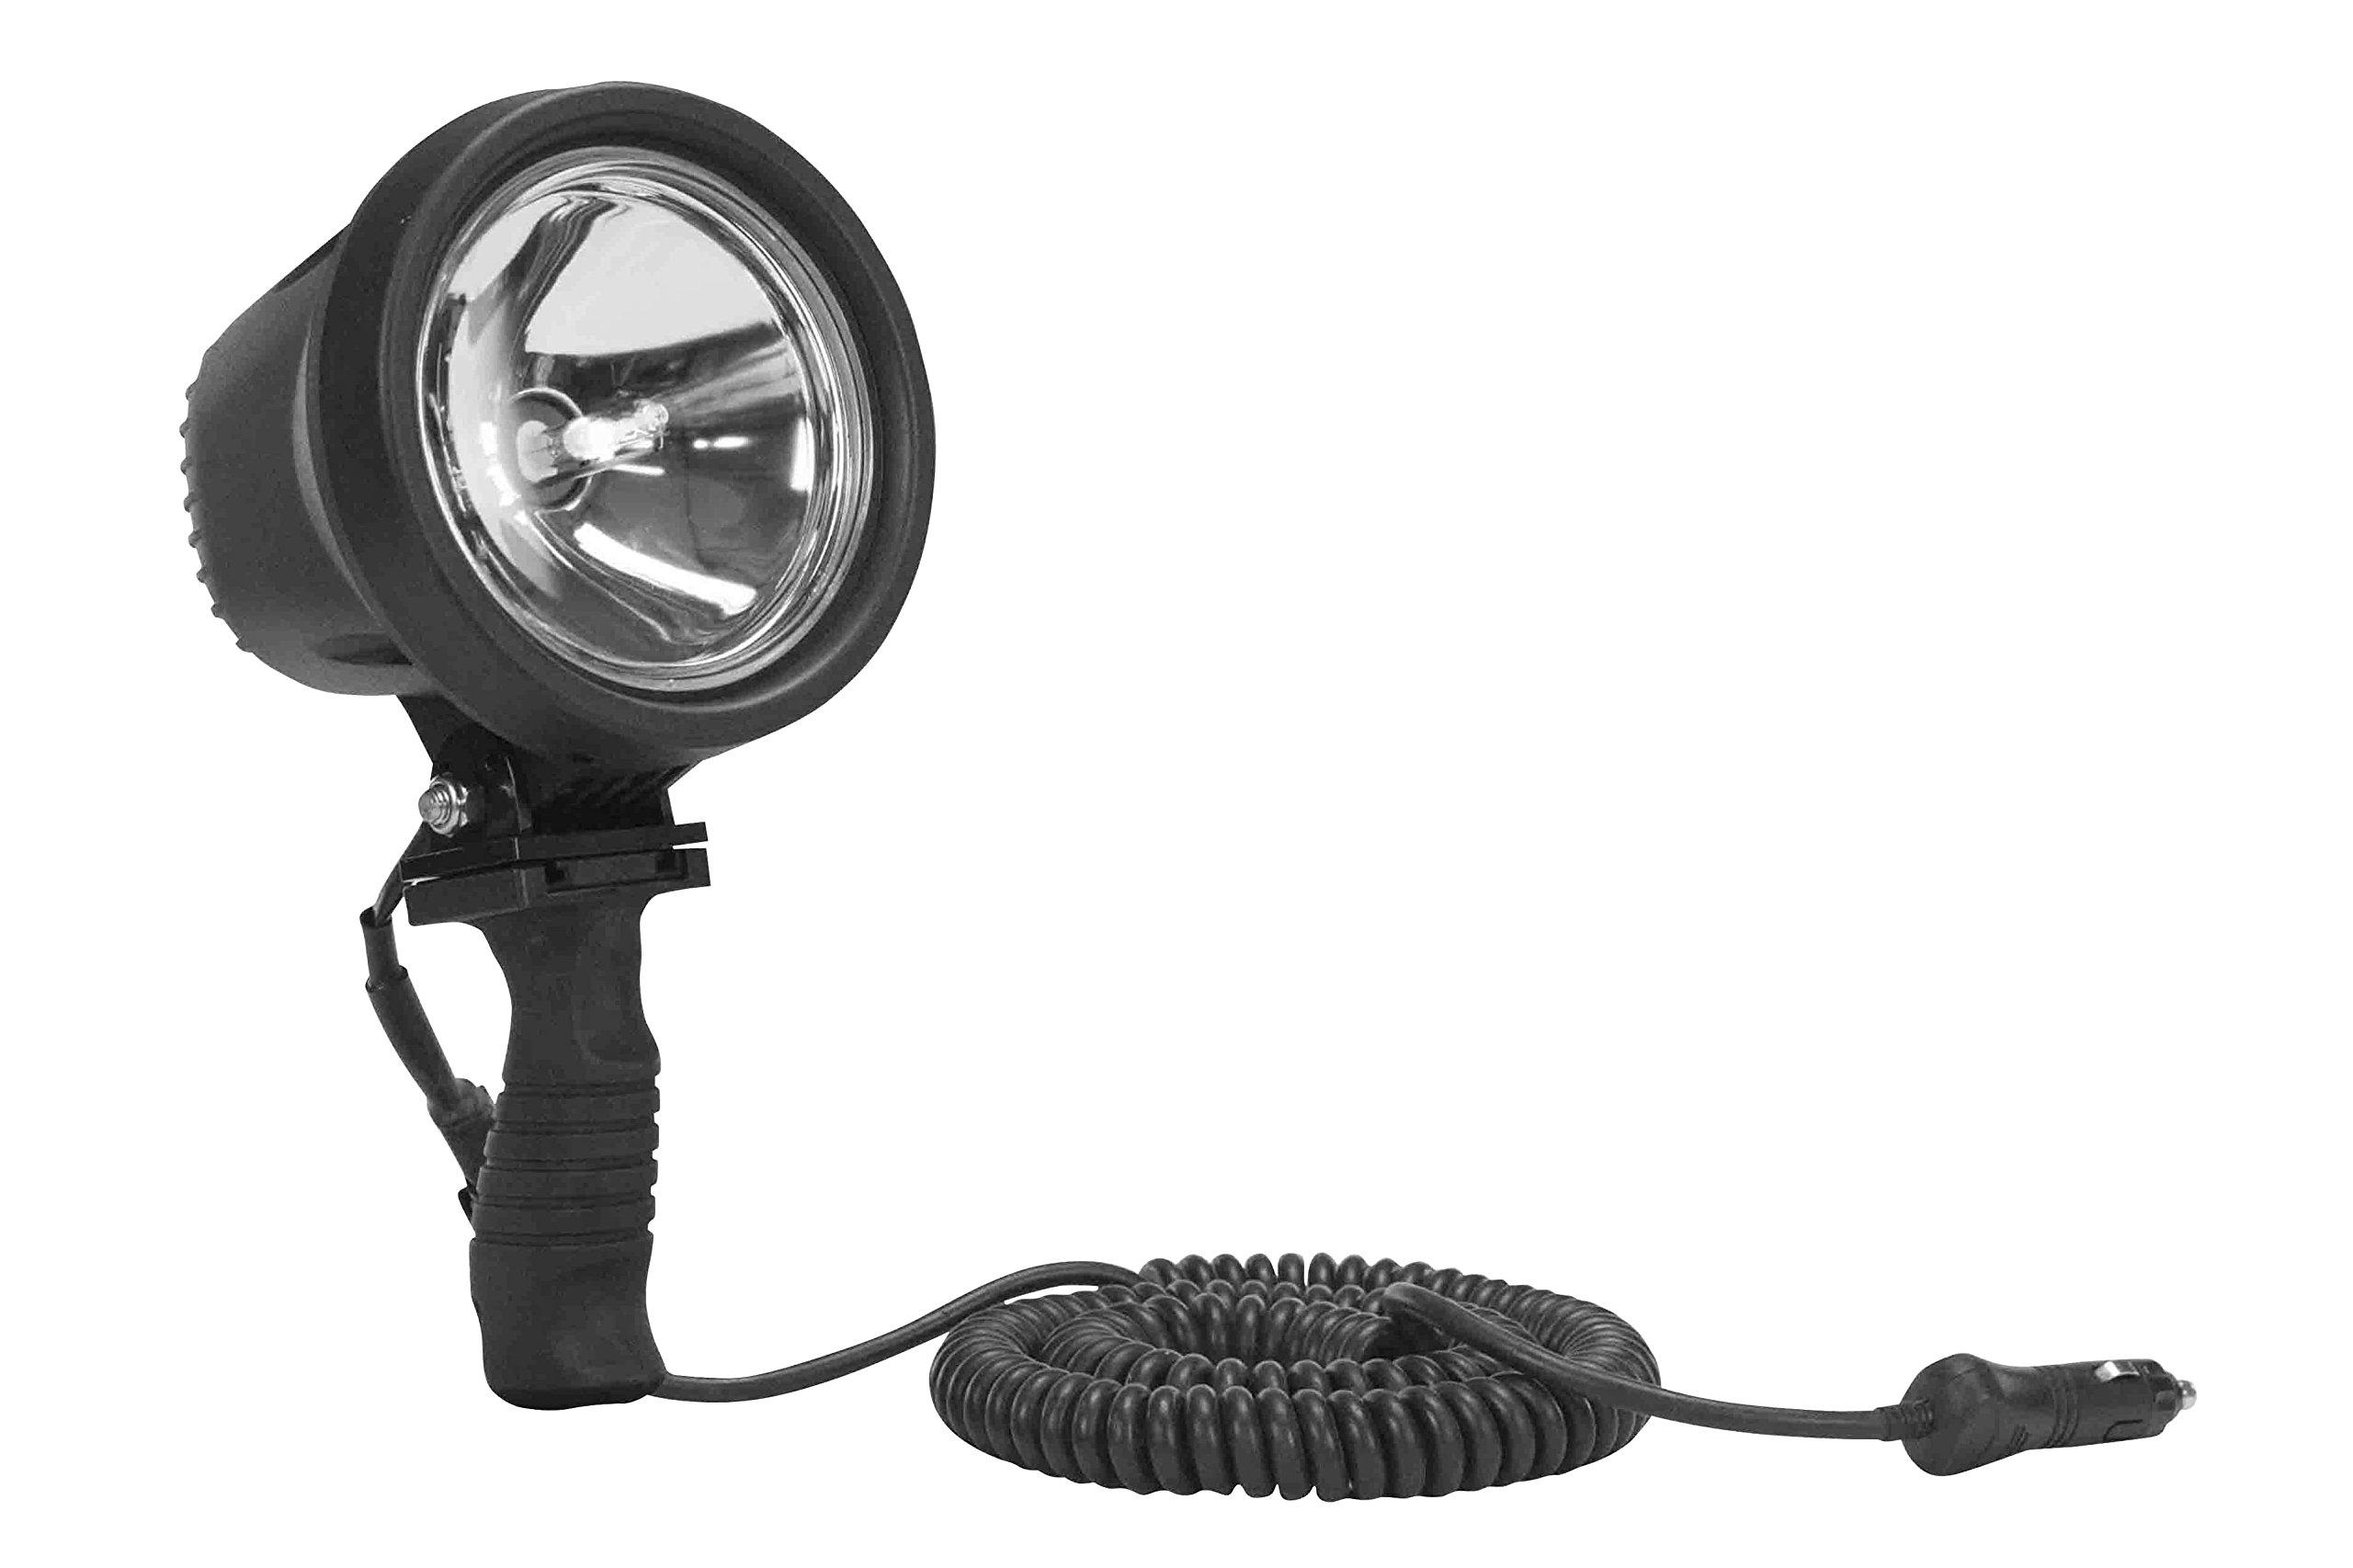 15 Million Candlepower - HID Handheld Spotlight - 16' Cord w/ Cigarette Plug(-12V-16' Batt Clamps)